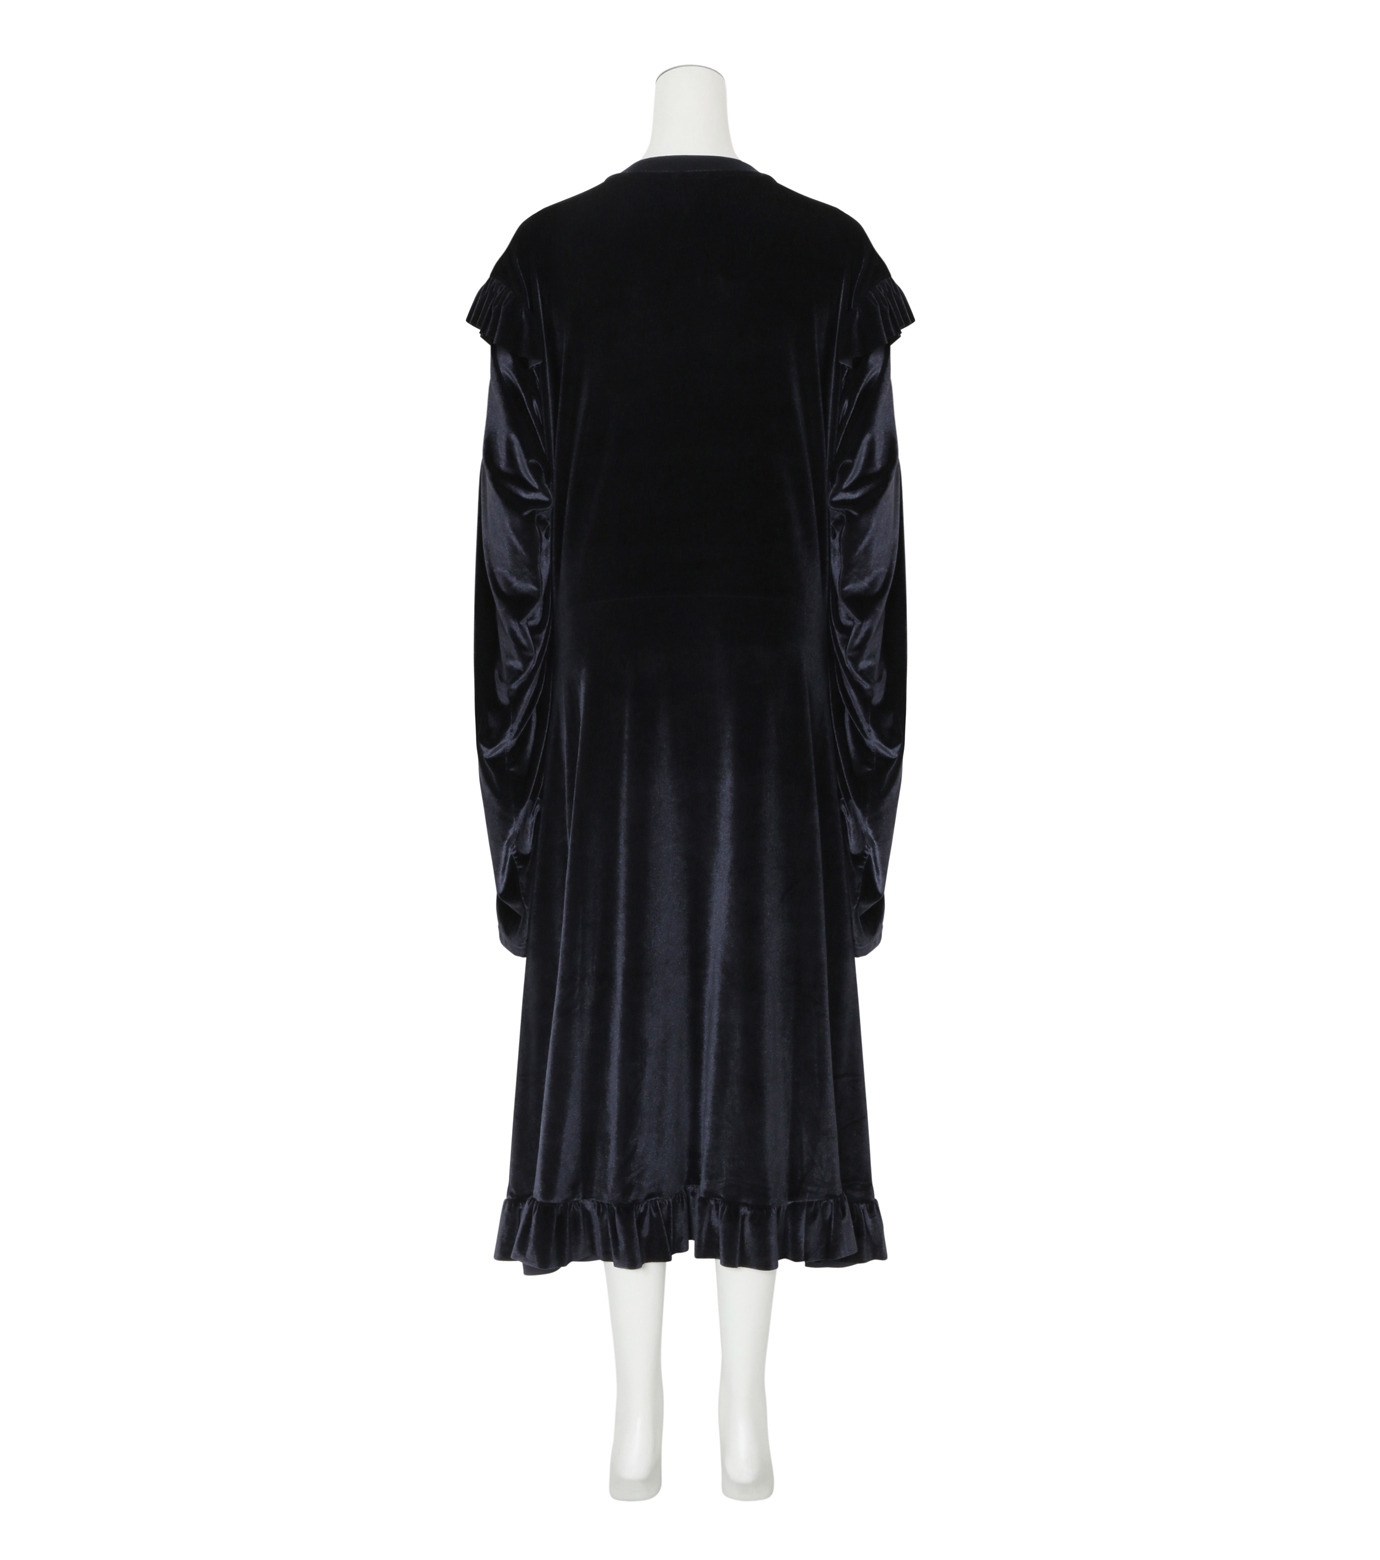 VETEMENTS(ヴェトモン)の70's Dress Velvet-BLACK(ワンピース/one piece)-WF17DR6-13 拡大詳細画像2